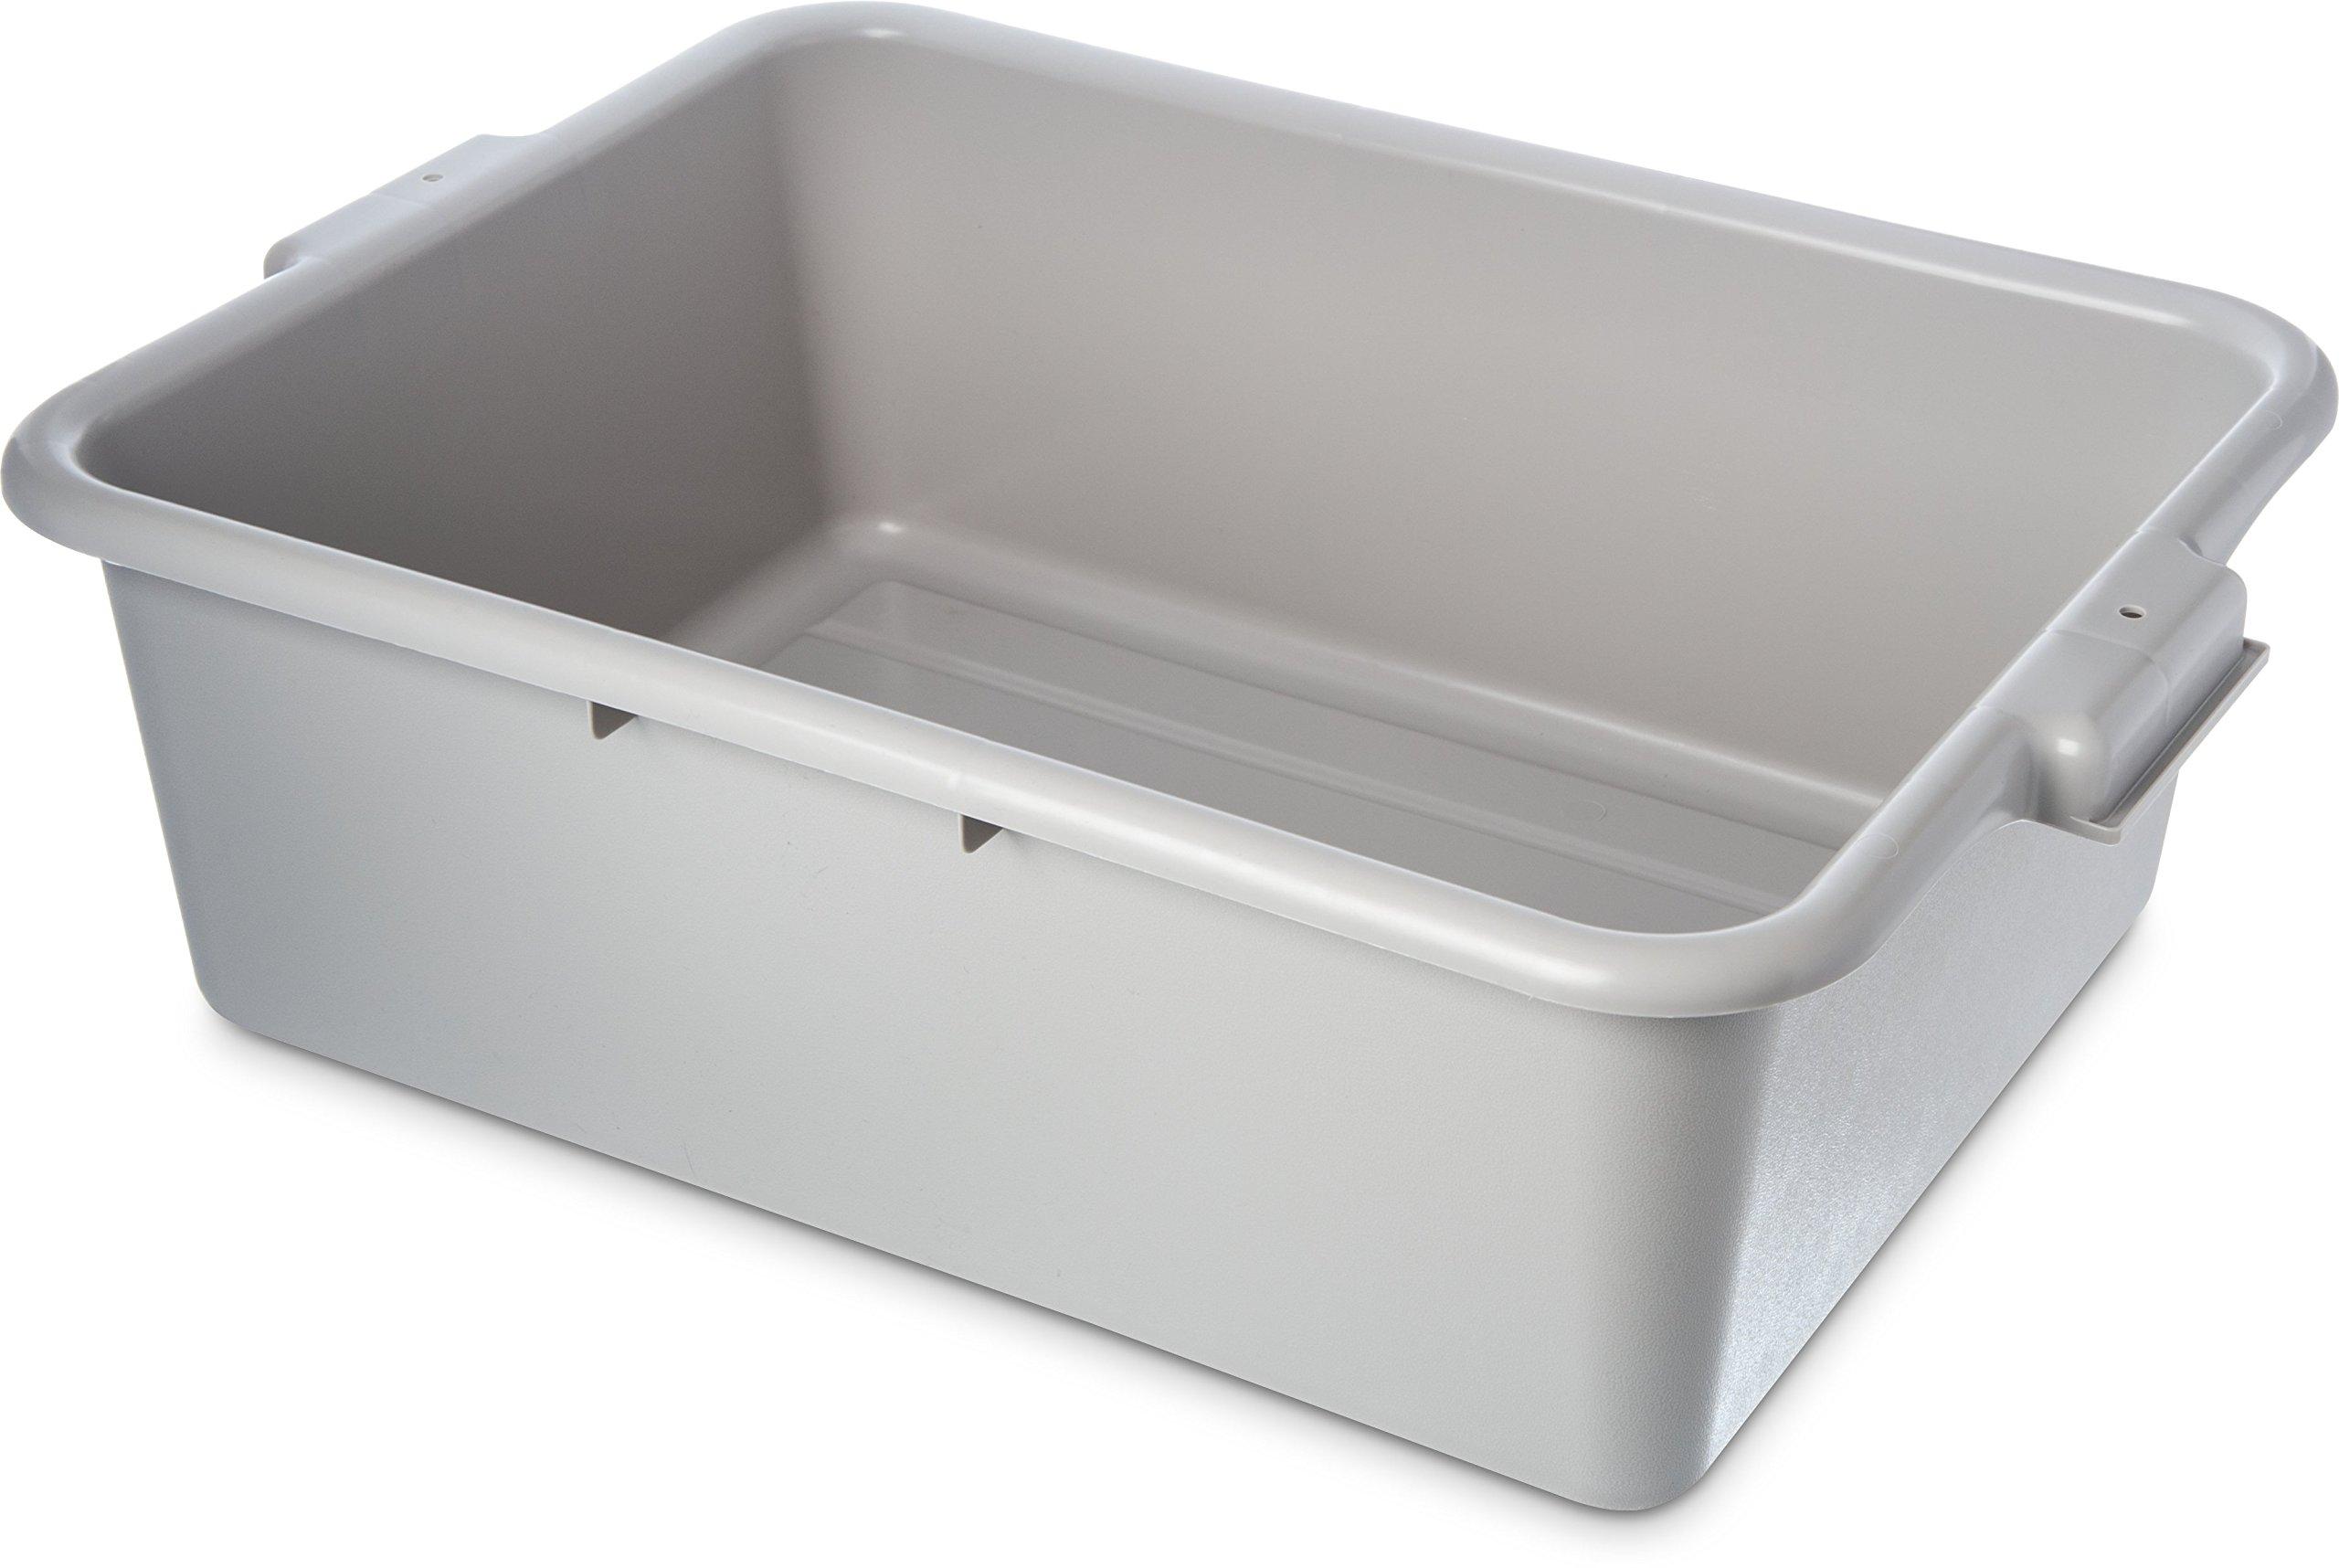 Black 7 Deep Carlisle 4401103 Comfort Curve Bus Box//Tote Box